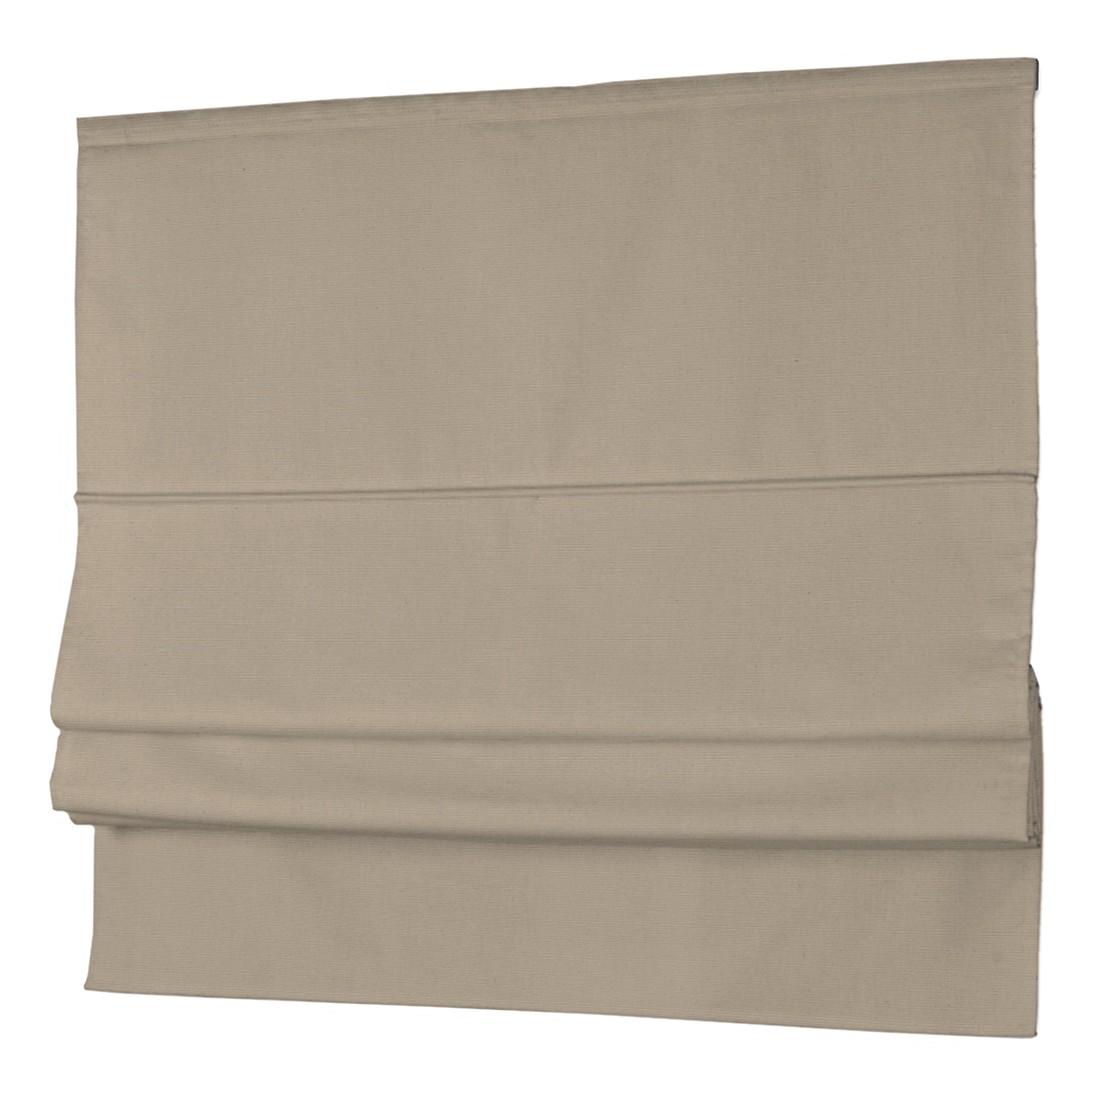 Raffrollo Cotton Panama – Braun – 130 x 170 cm, Dekoria kaufen